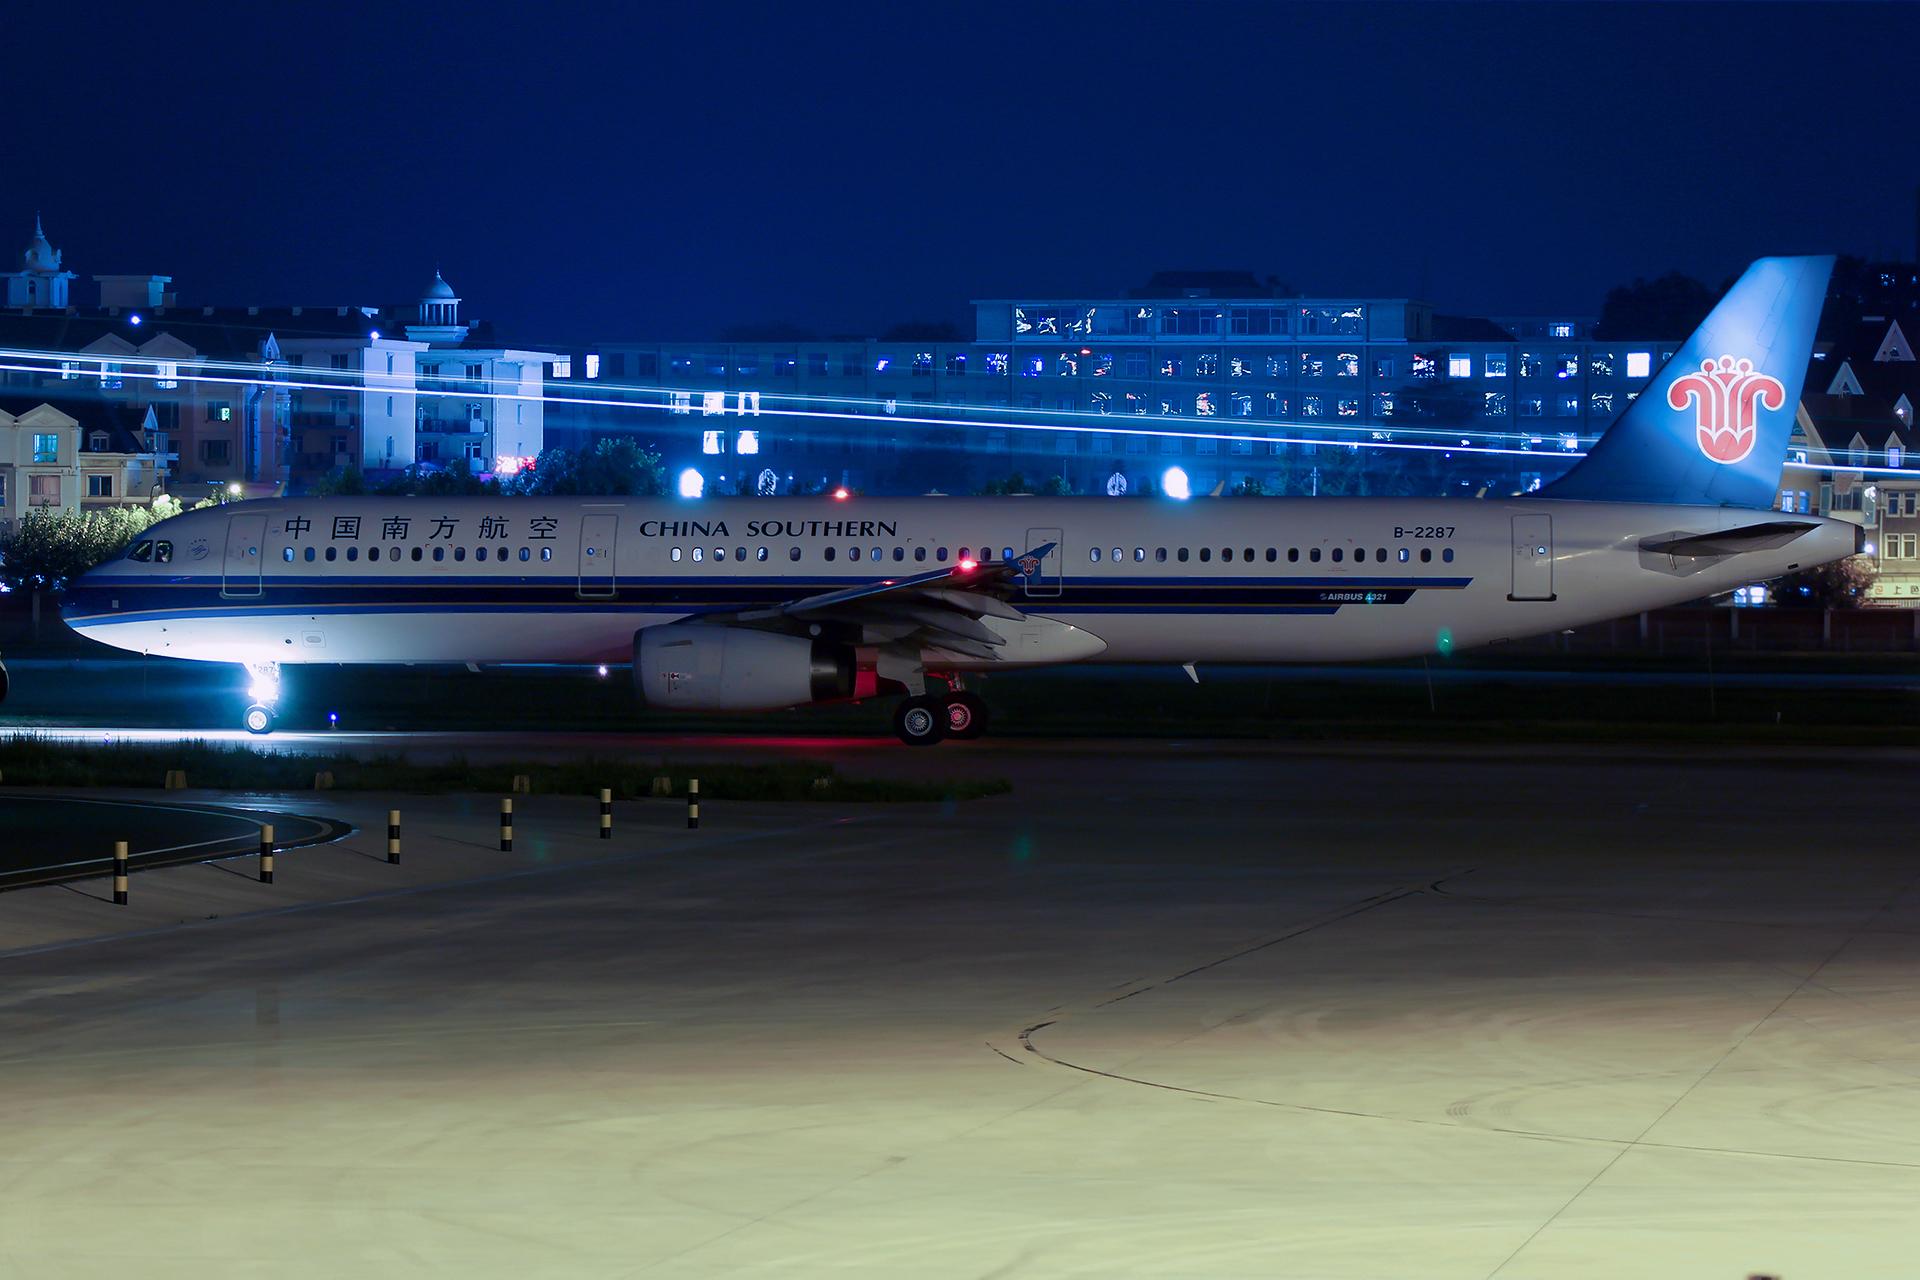 Re:[原创][DLC]。。。夜景两张 。。。 AIRBUS A321-200 B-2287 中国大连国际机场